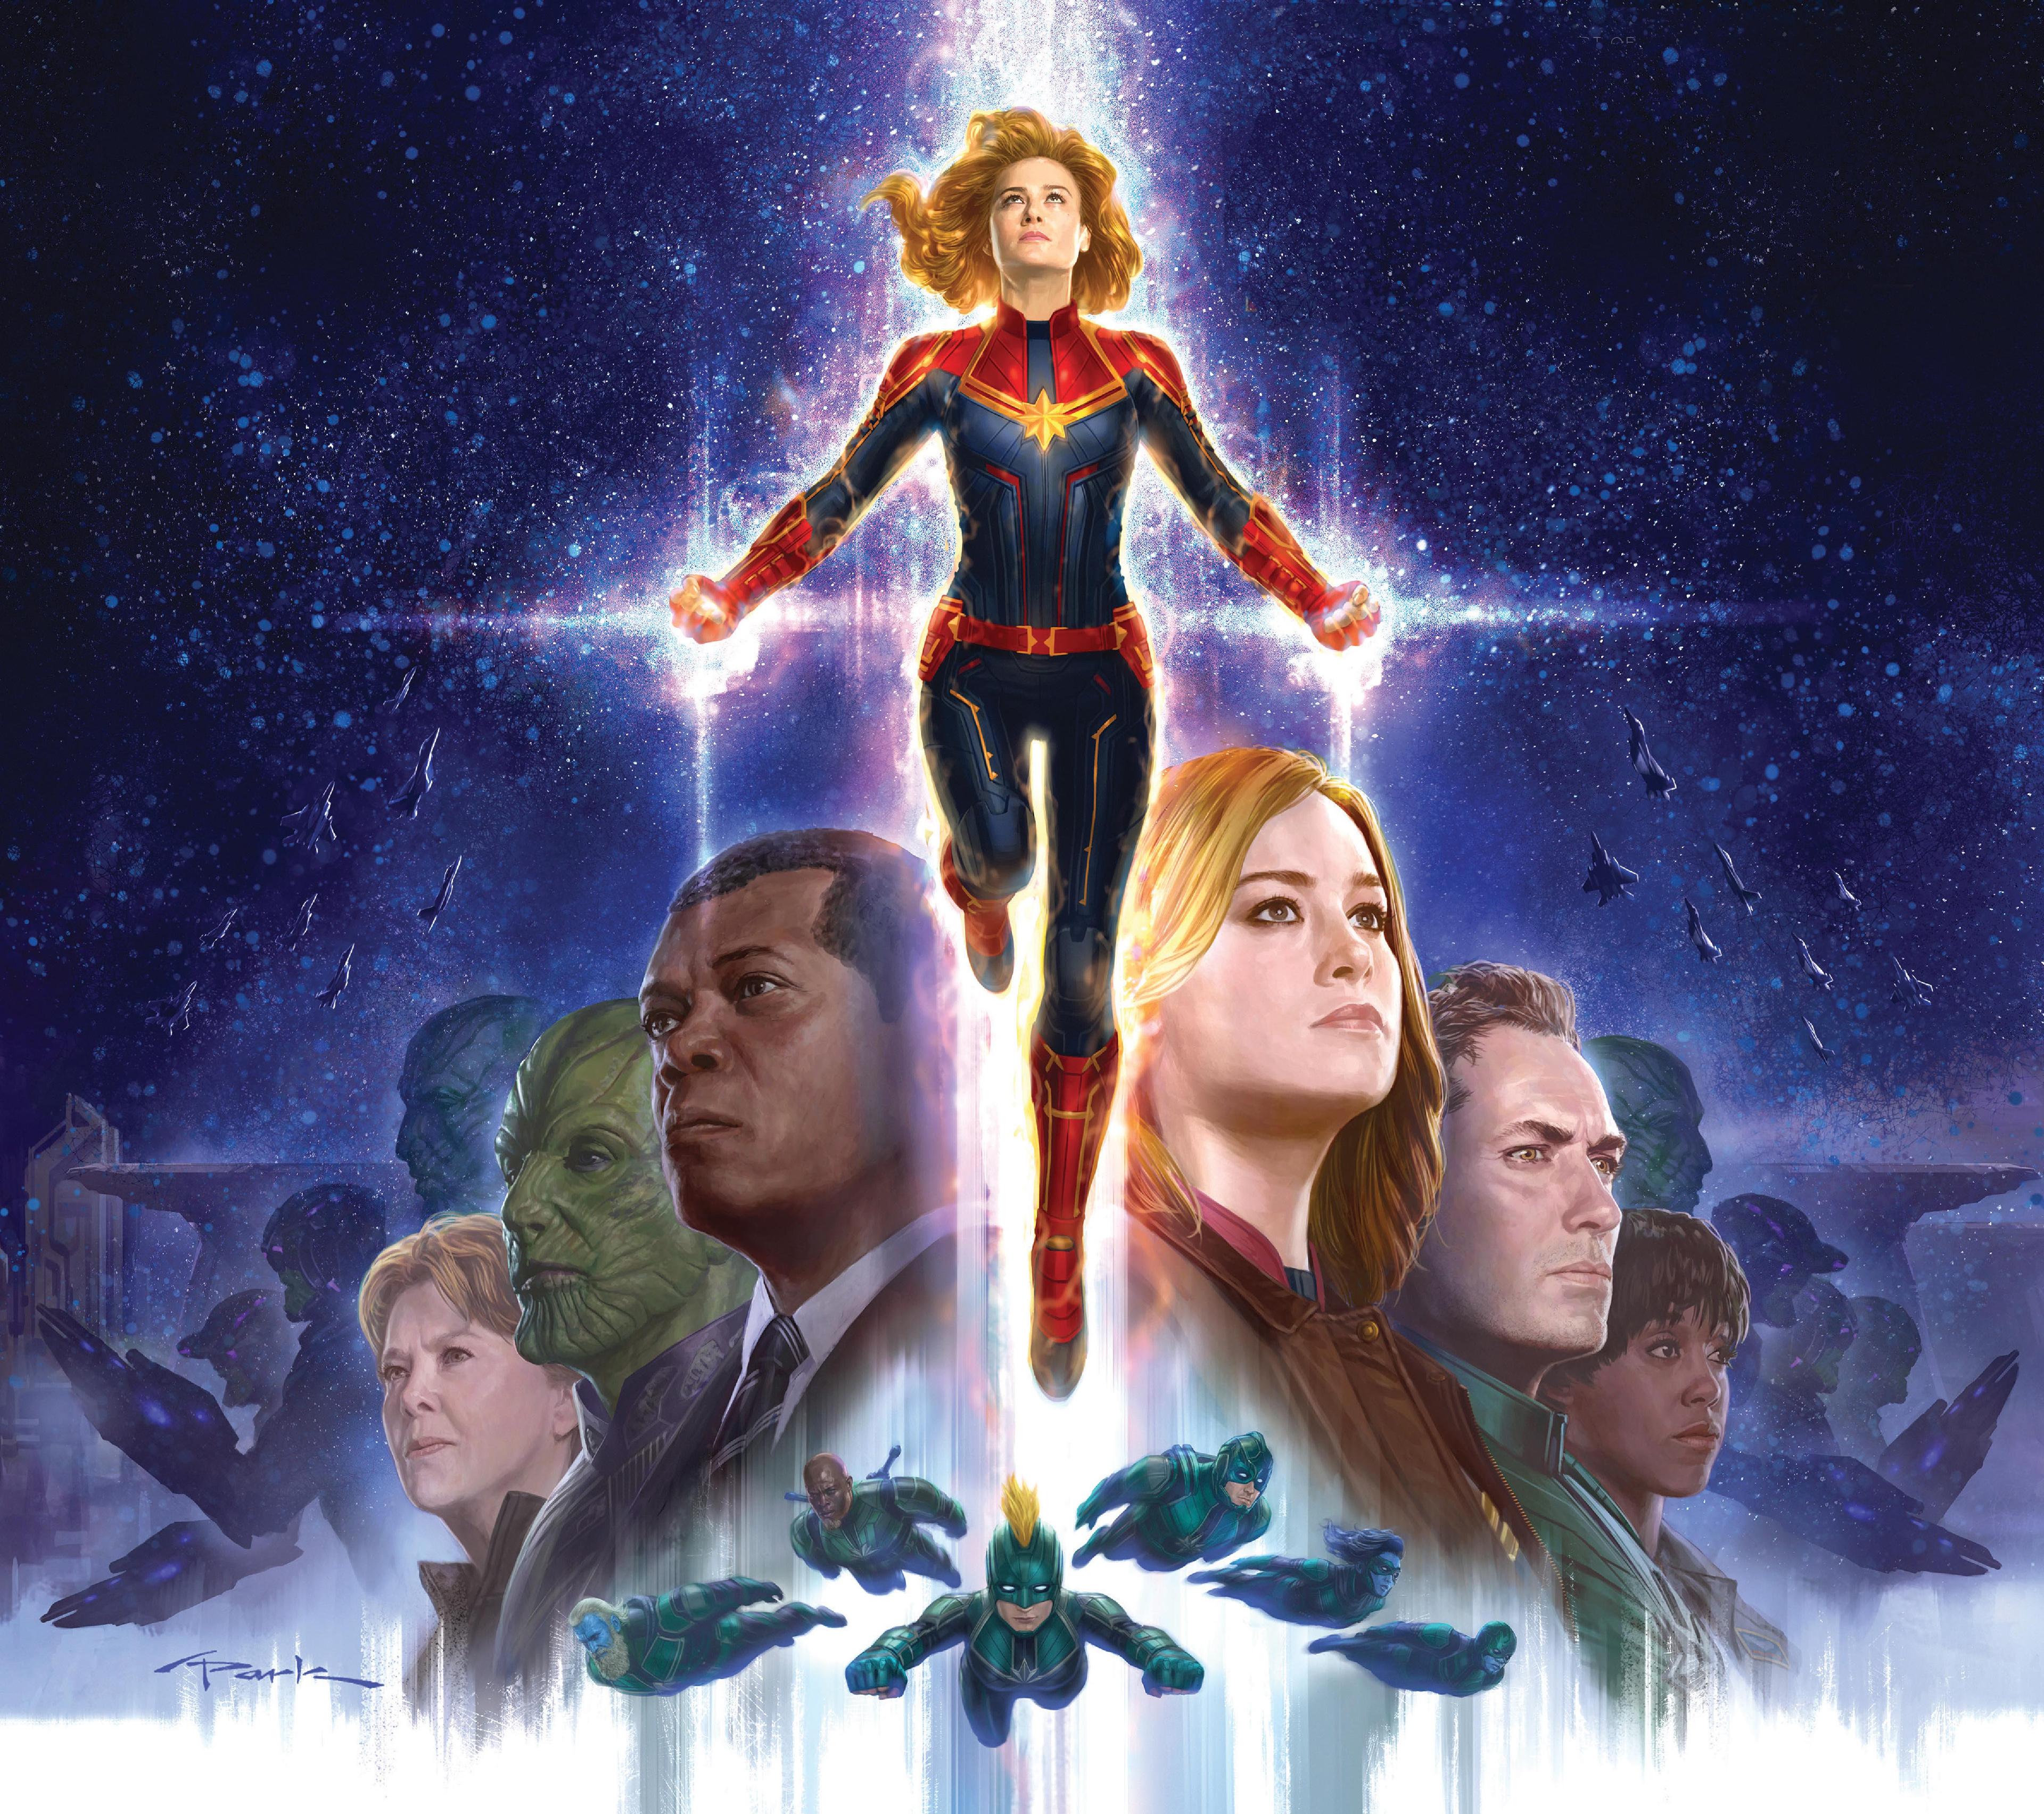 Captain Marvel 2019 4K Wallpaper, HD Movies 4K Wallpapers